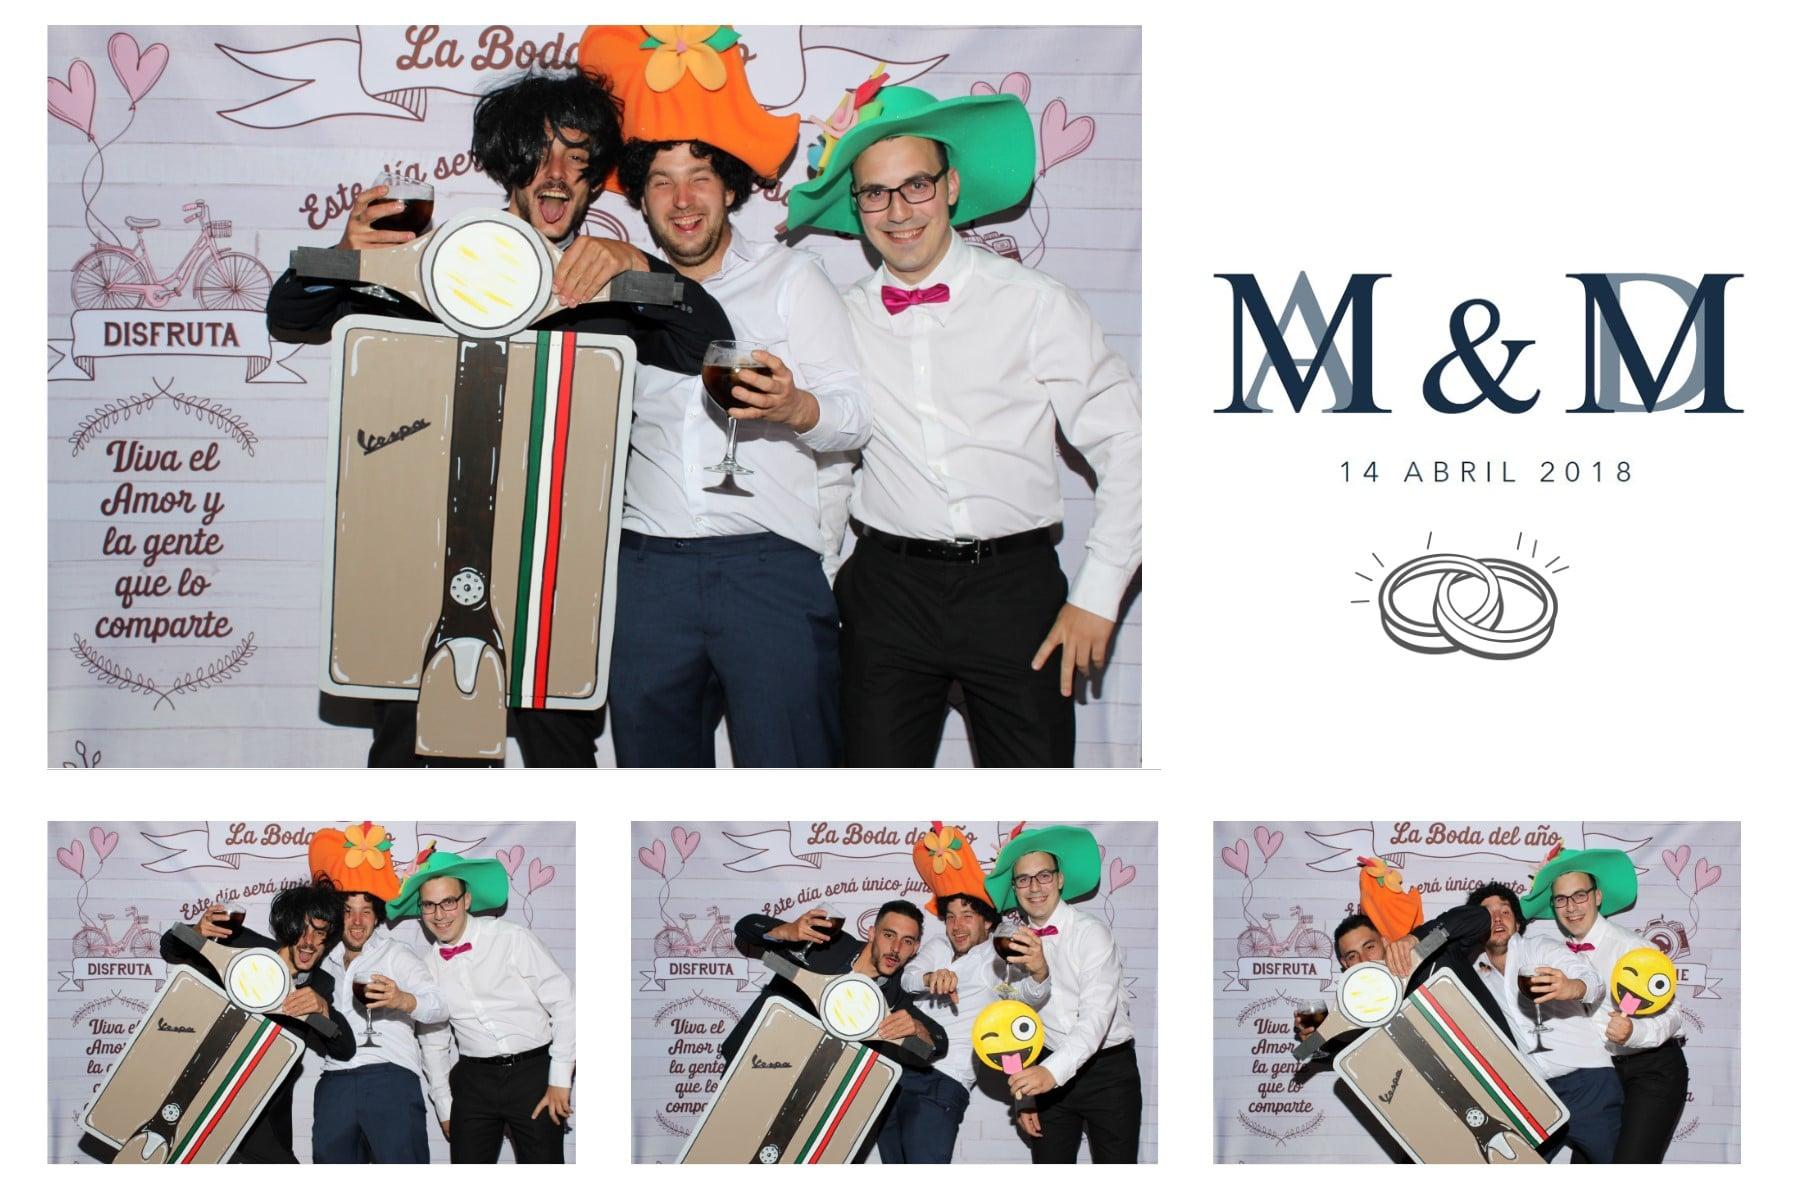 M&M_MrFotomaton 14042018 (1)-min